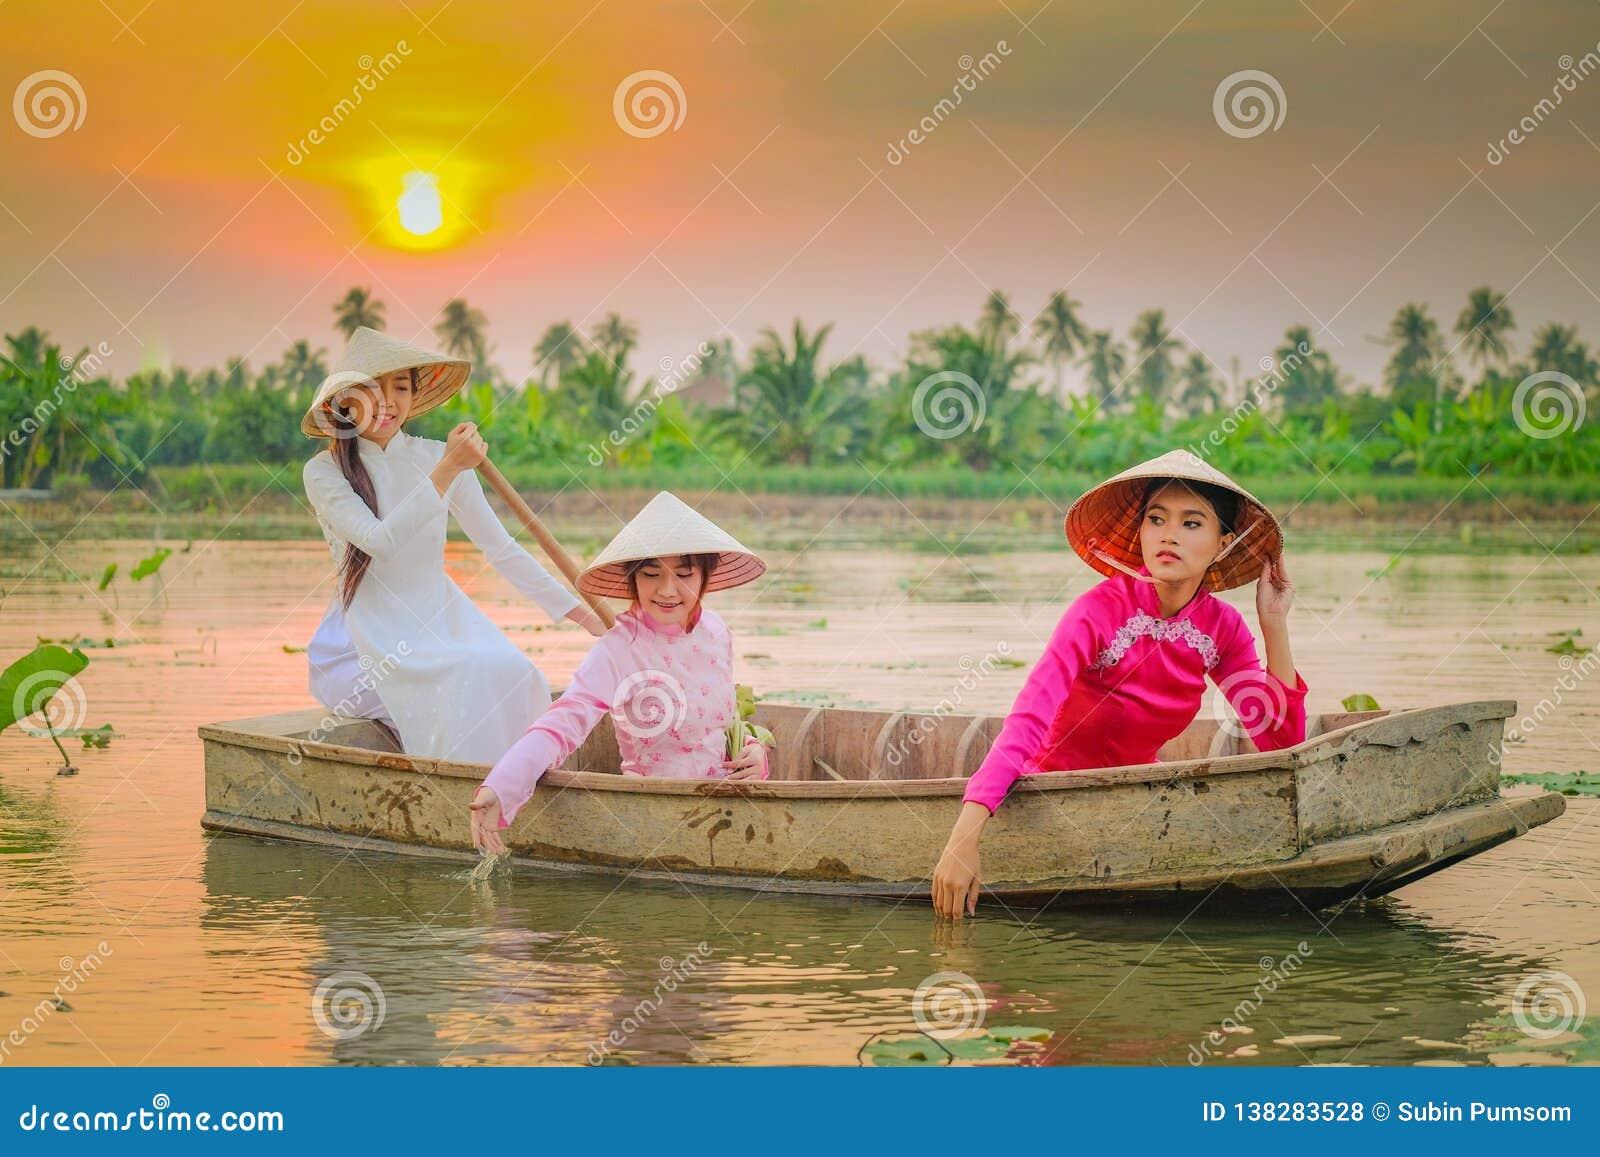 Drie Vietnamese meisjes roeien in de lotusbloemtuin